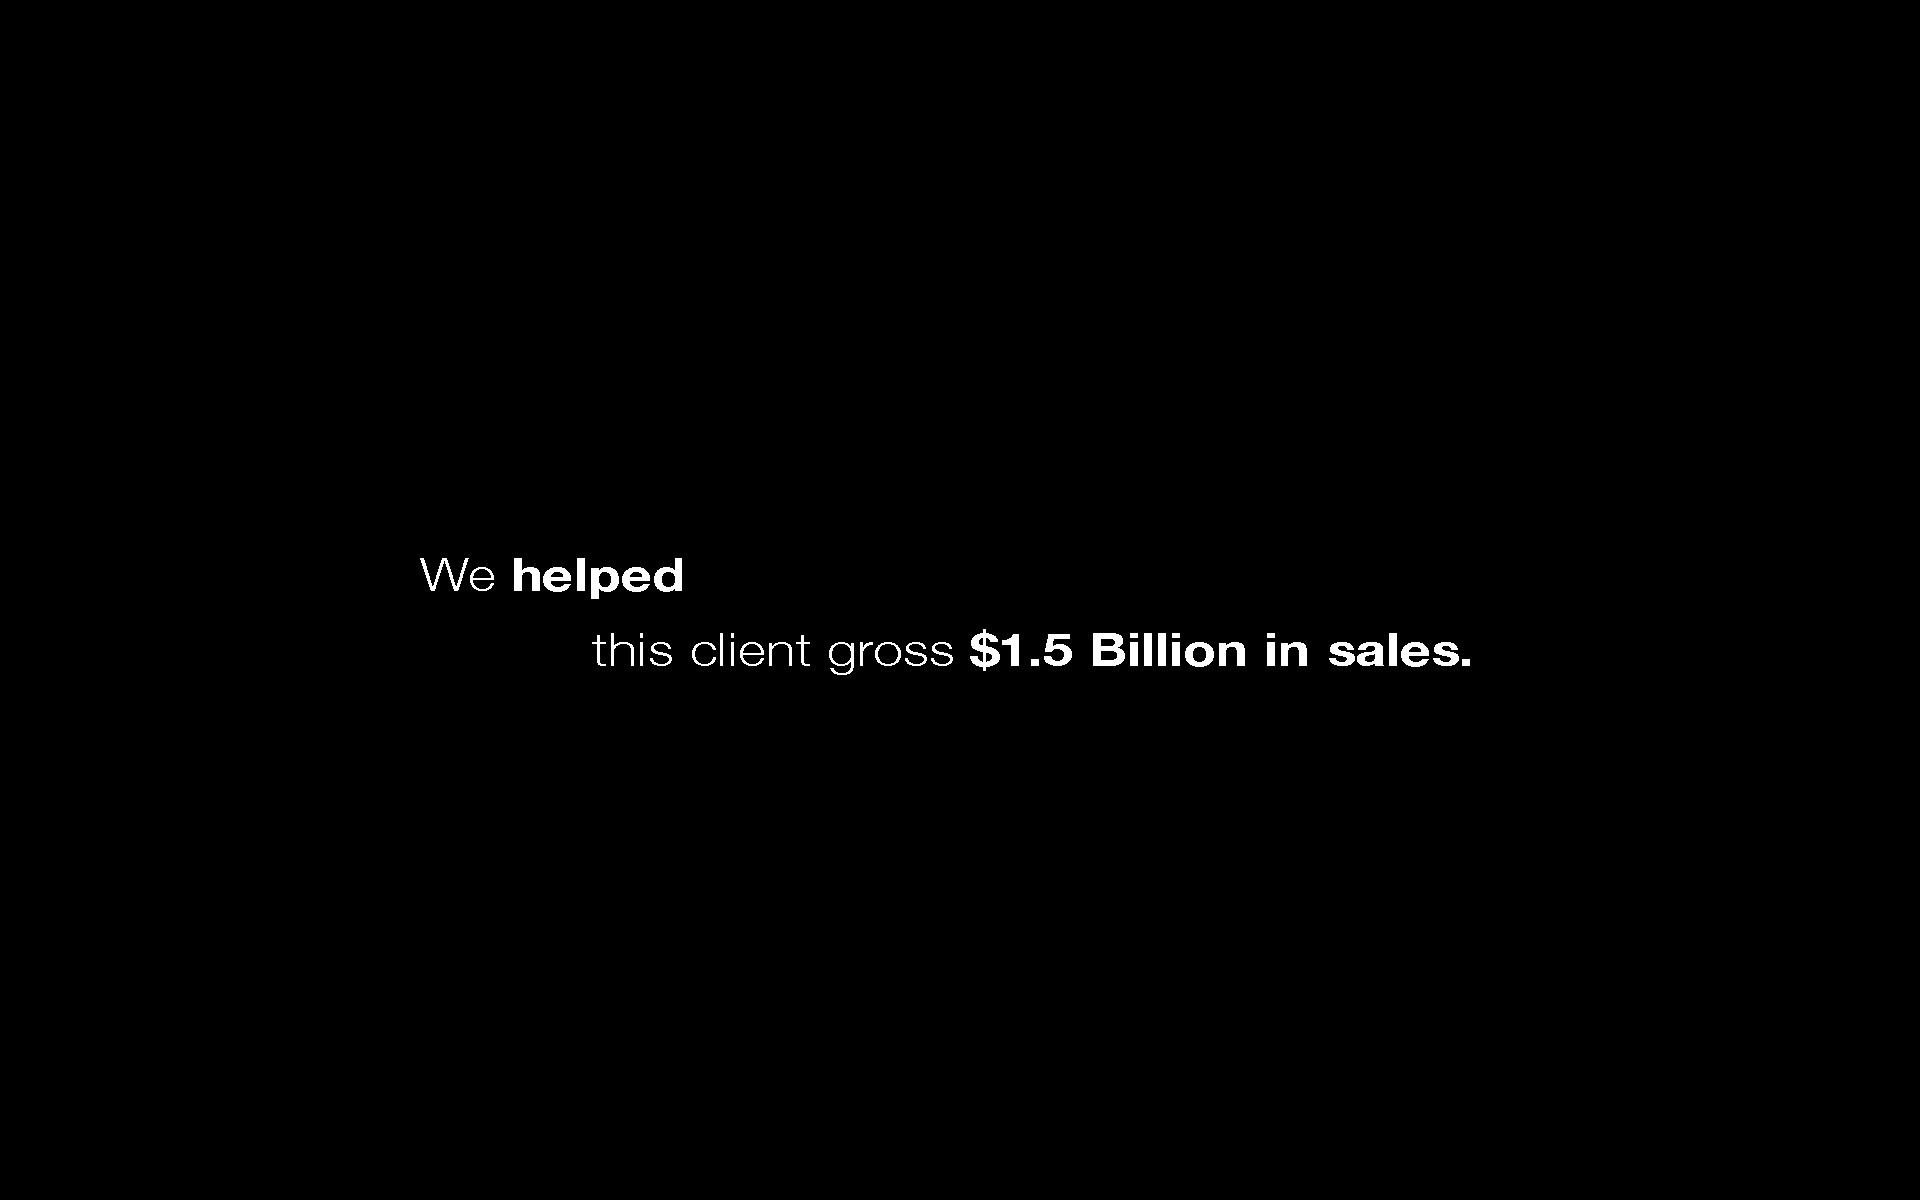 Web We helped $1.5 billion in sales.jpg